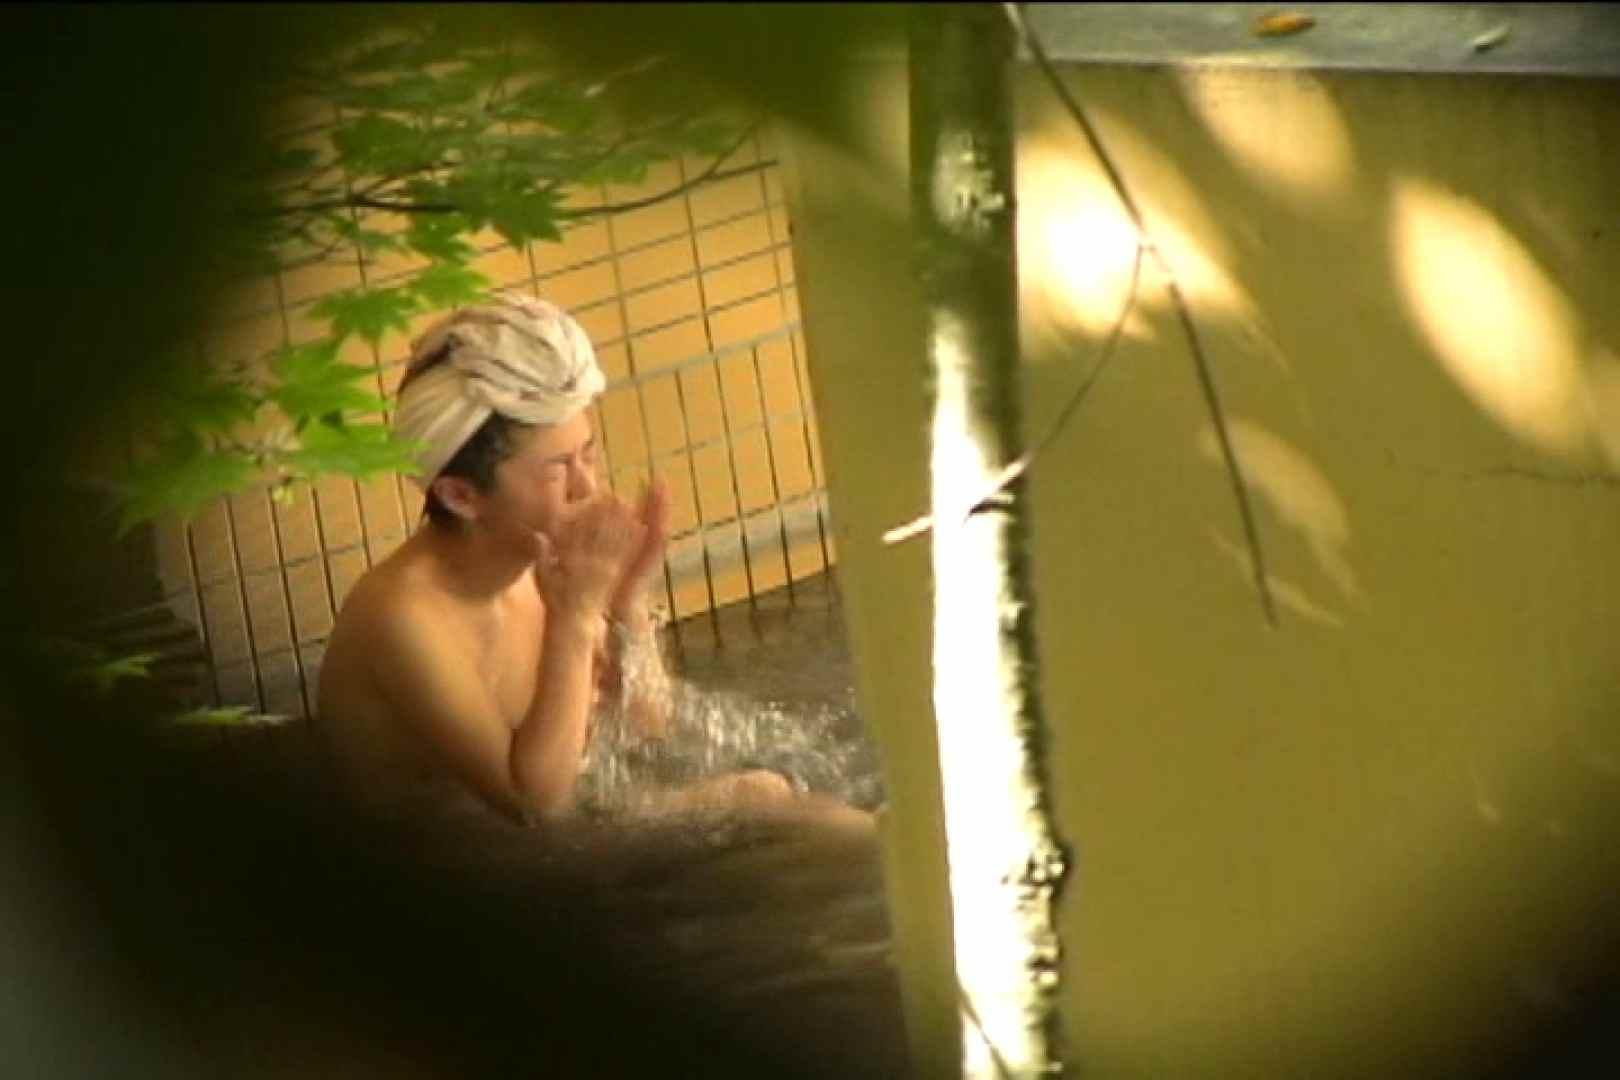 Aquaな露天風呂Vol.454 露天   HなOL  66pic 55